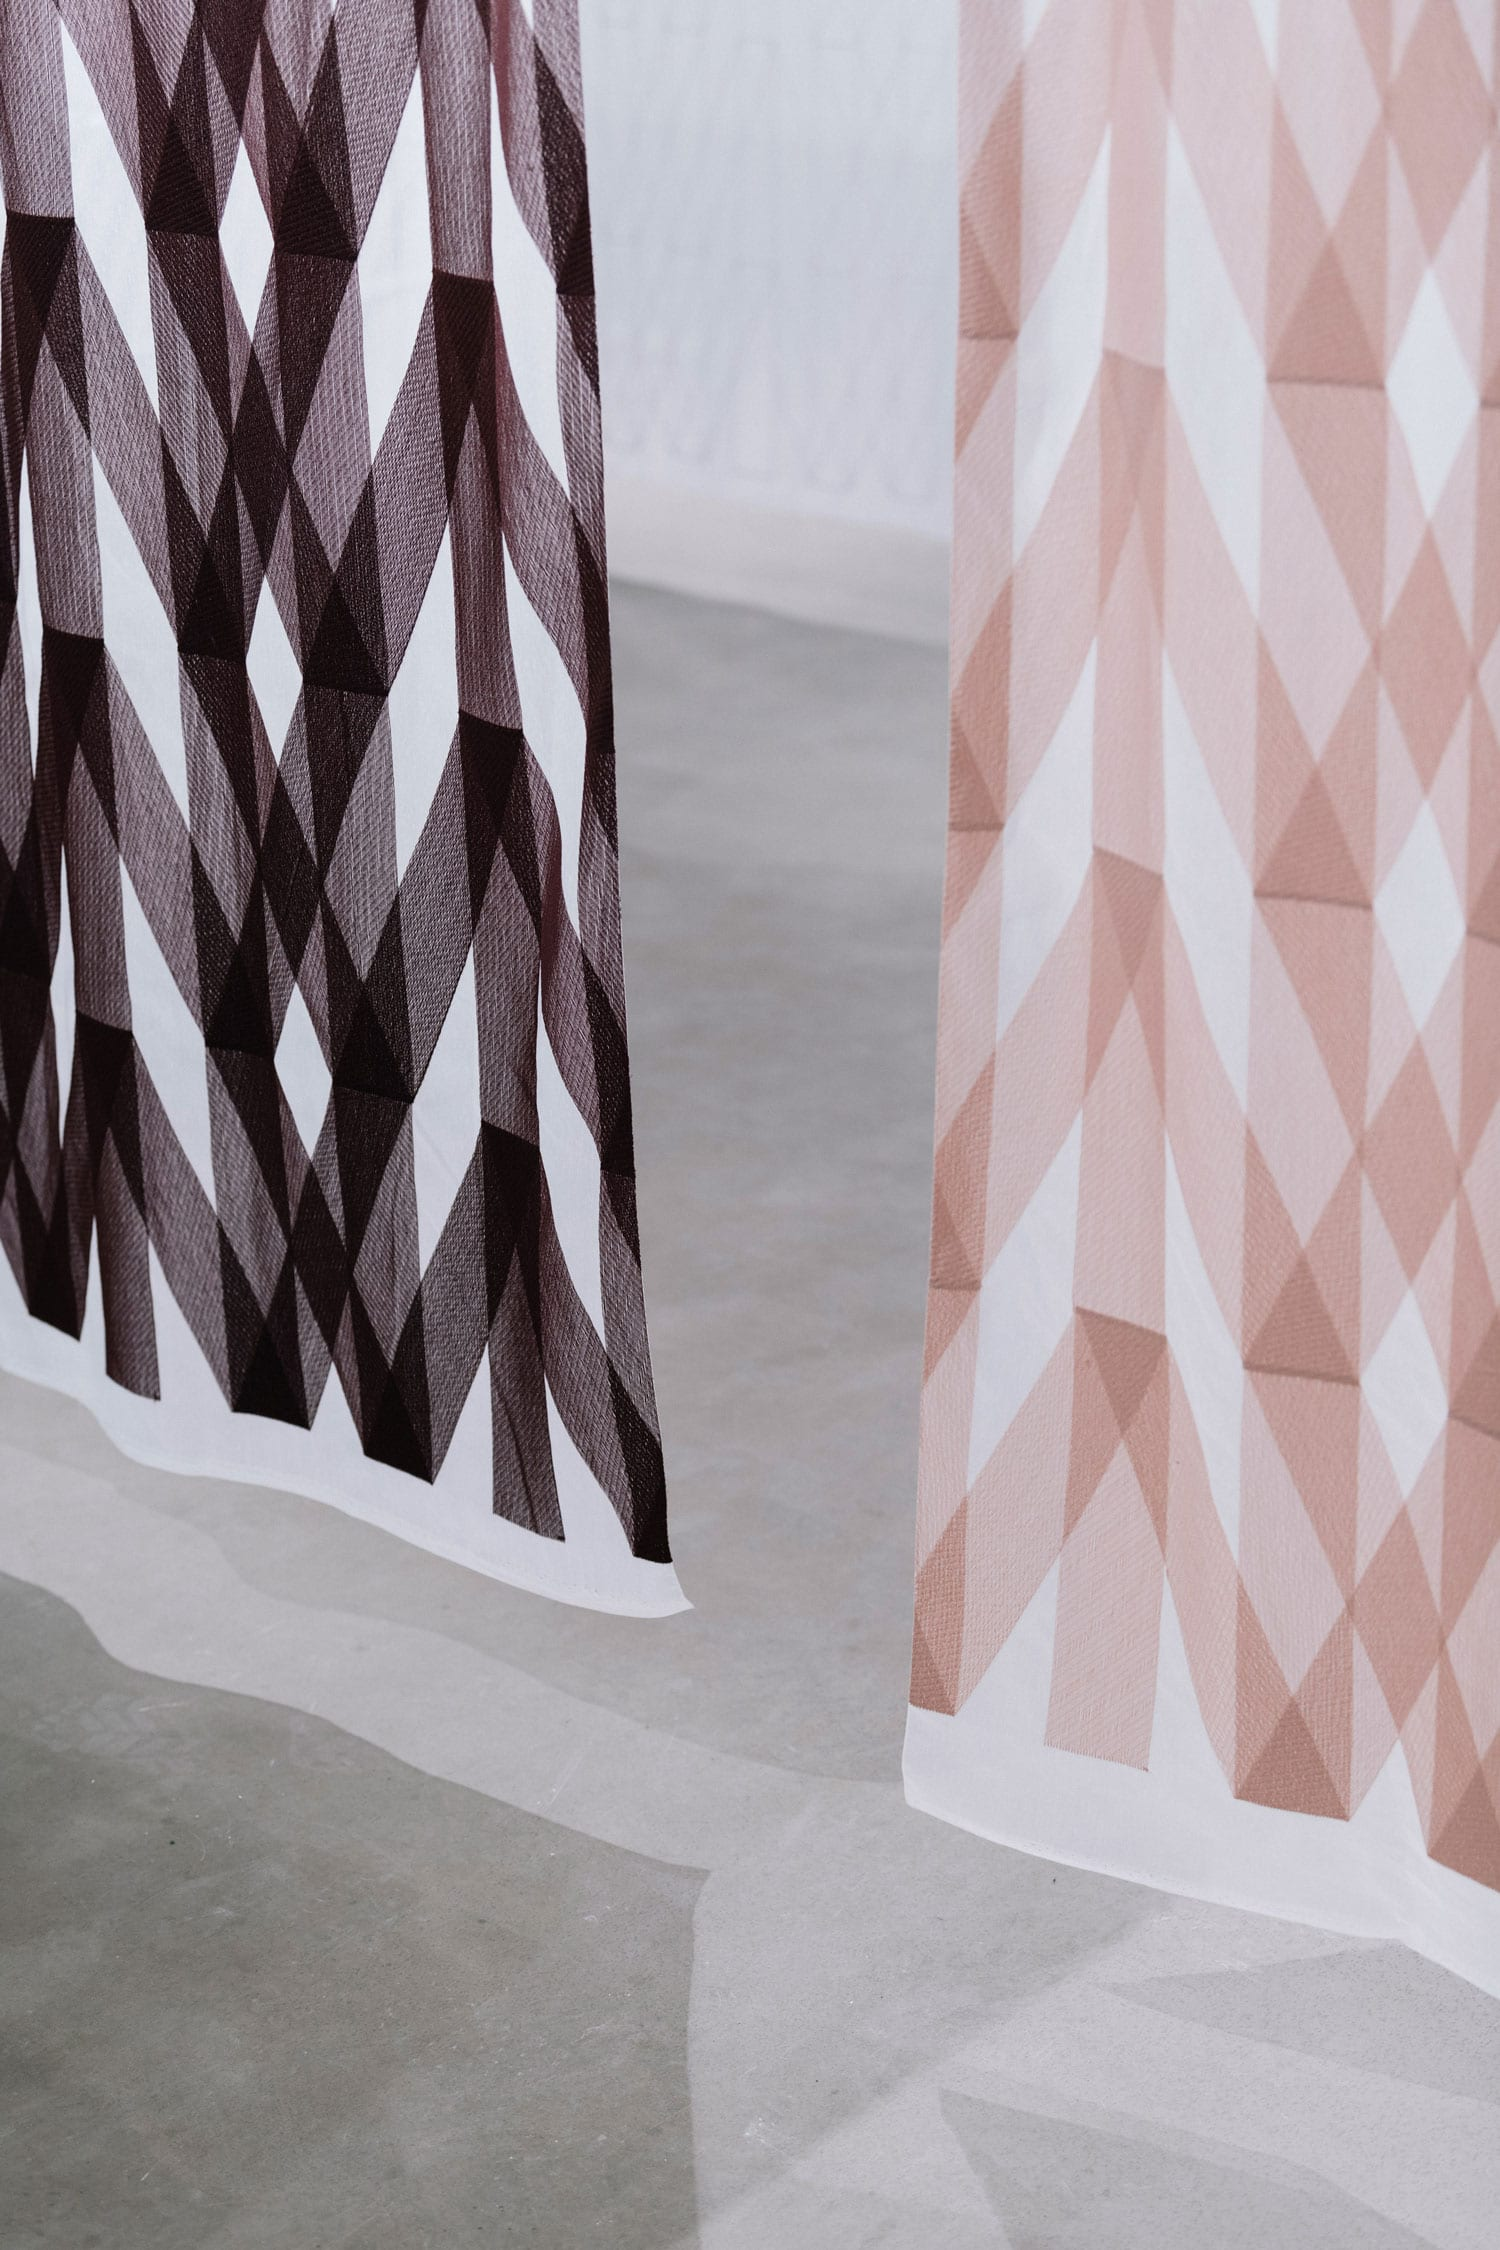 Ronan & Erwan Bouroullec Embroider Geometric Patterns on Translucent Kvadrat Fabric Stockholm Furniture Fair 2018 | Yellowtrace